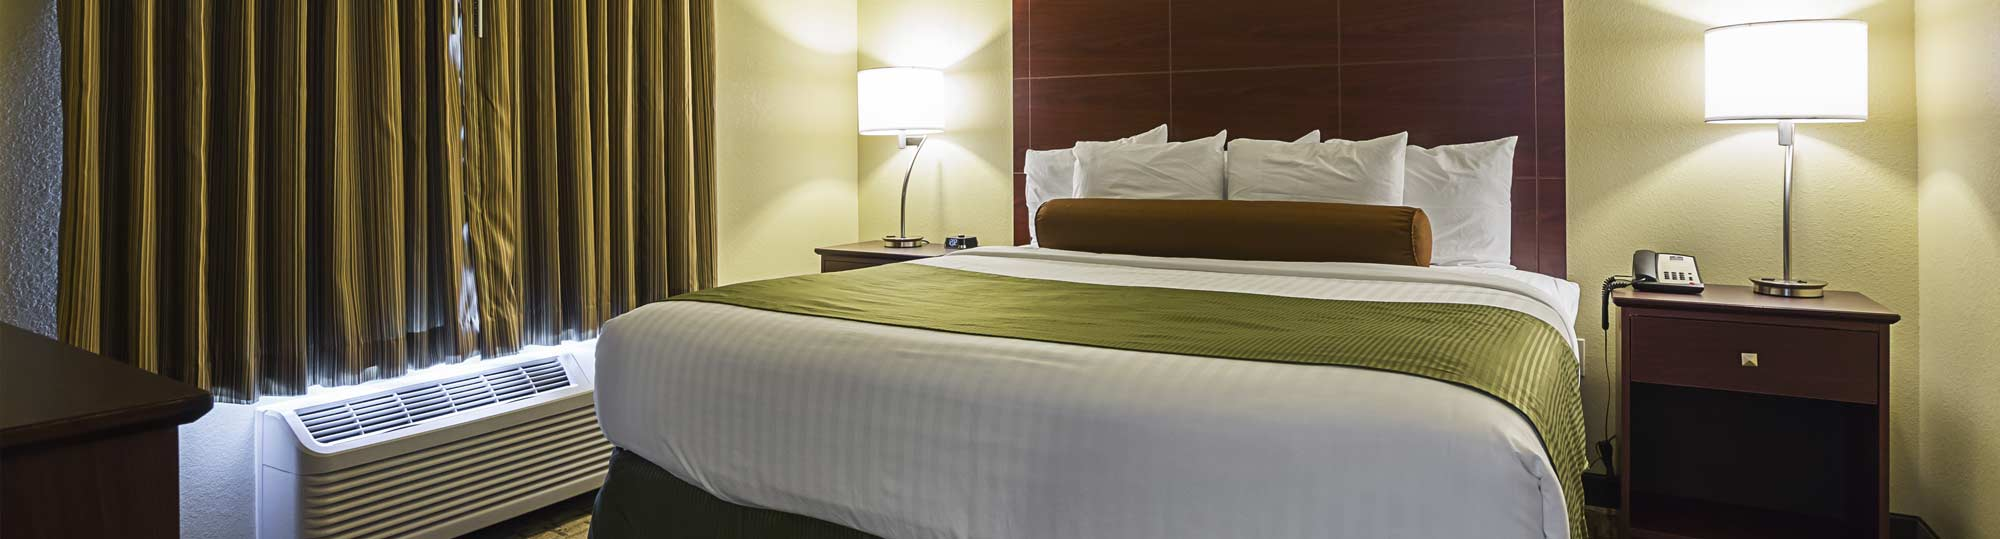 Cobblestone Inn and Suites Soda Springs